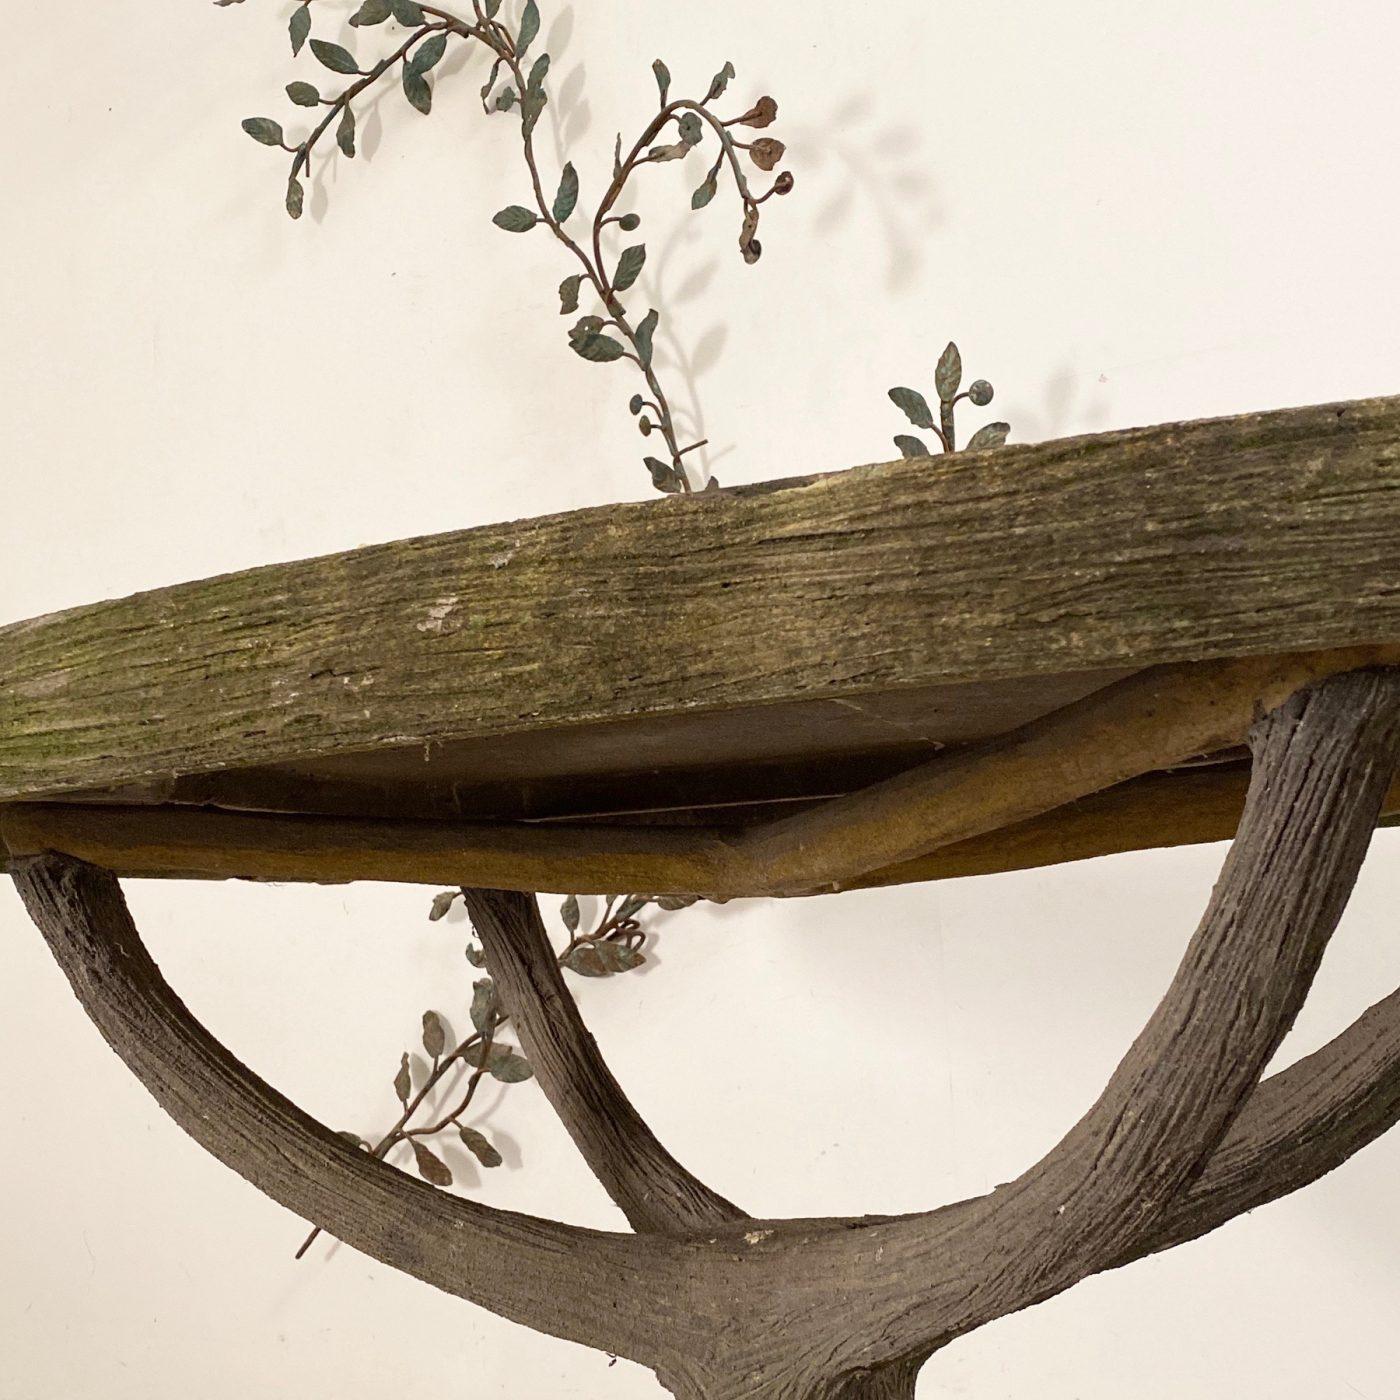 objet-vagabond-garden-set0001